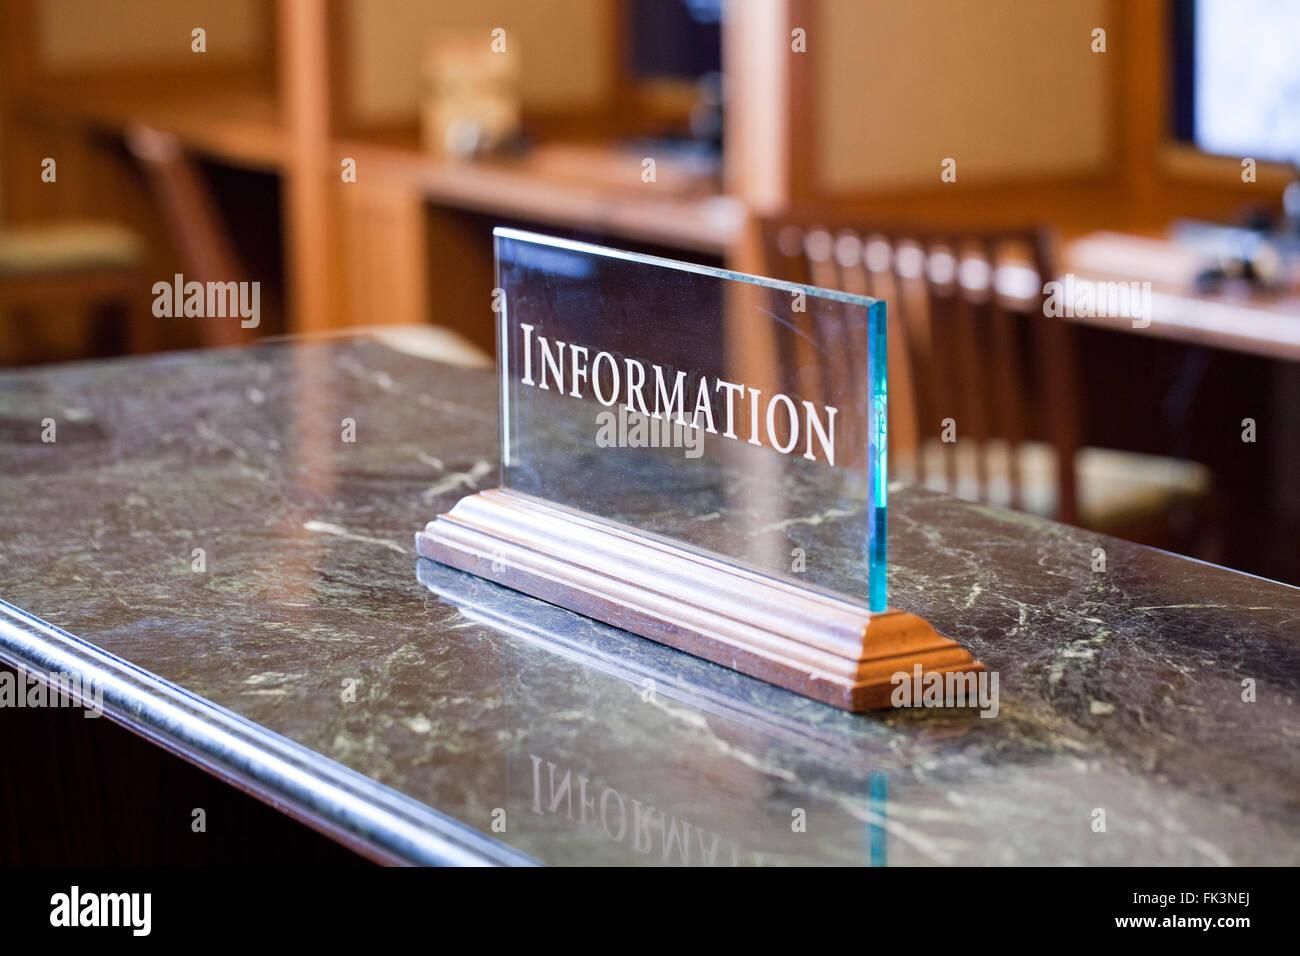 Information desk plate - USA Stock Photo